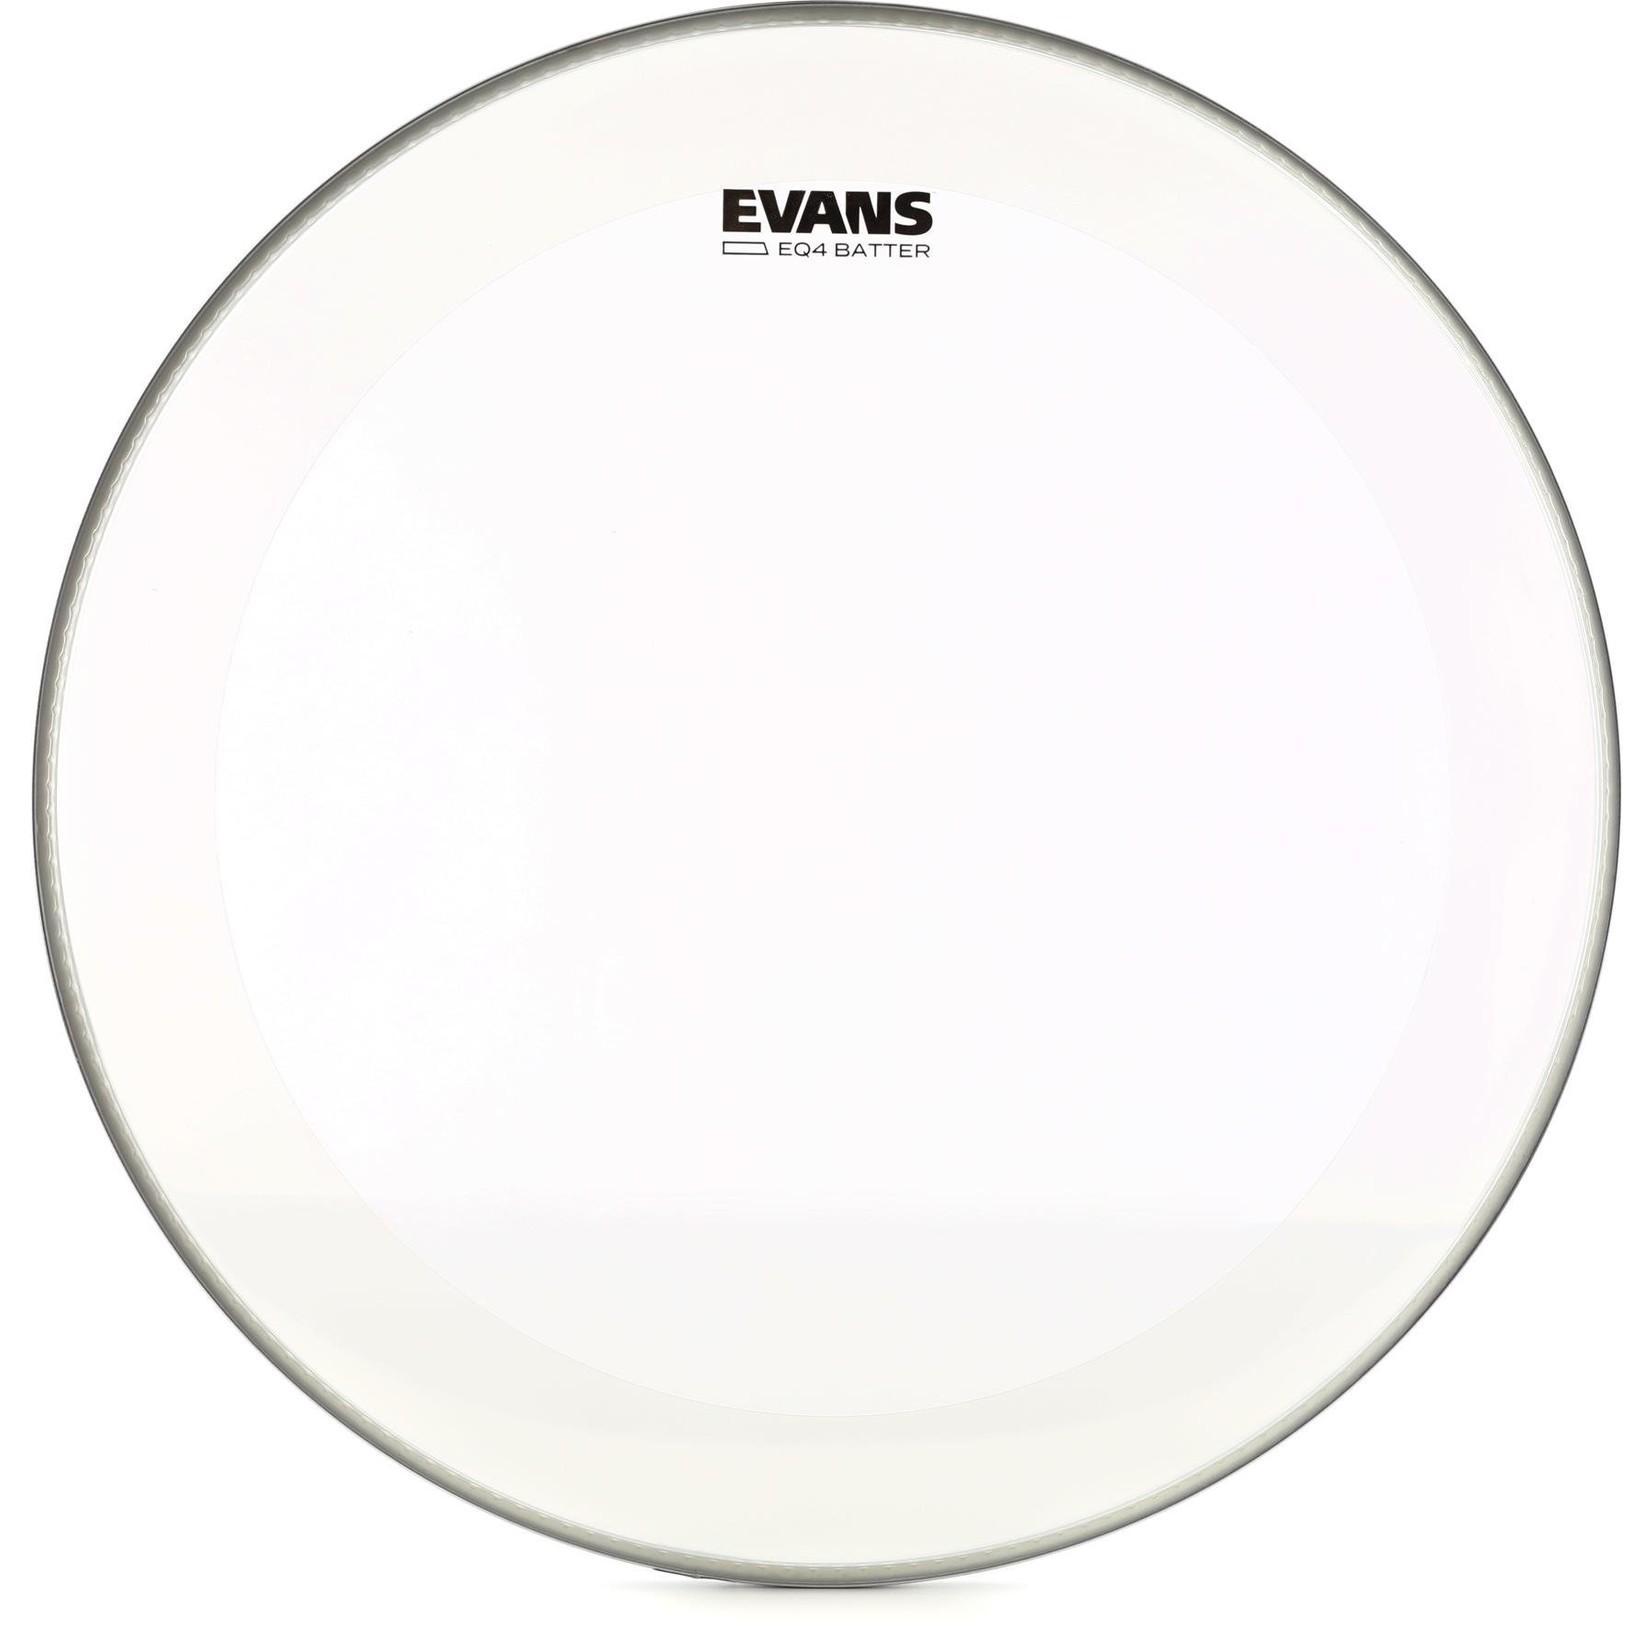 Evans Evans Clear EQ4 Bass Drum Batter